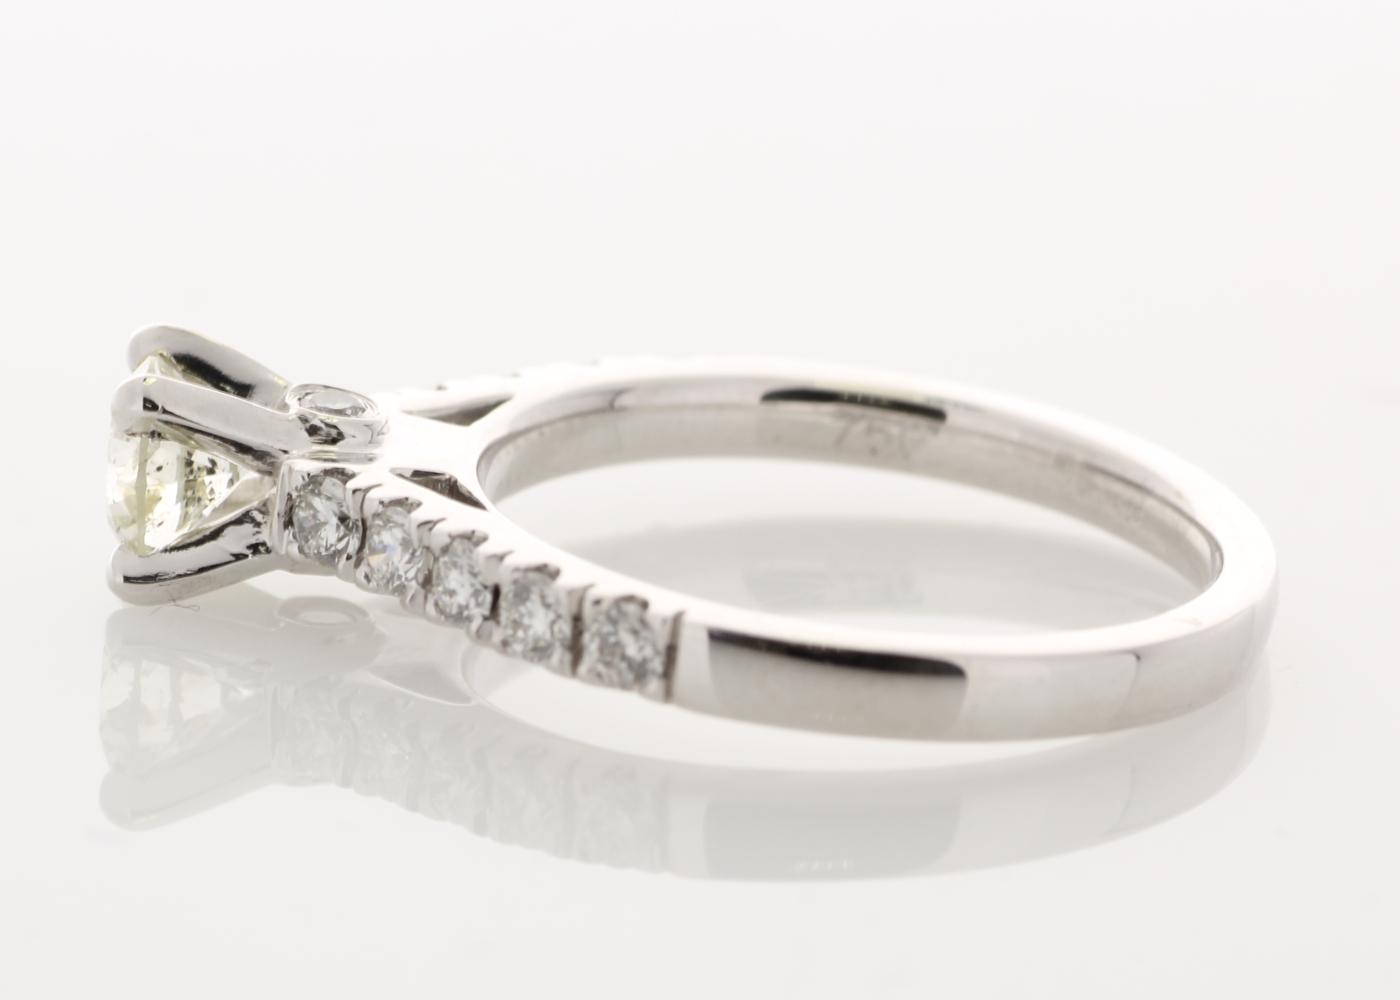 18k White Gold Stone Set Shoulders Diamond Ring 0.91 Carats - Image 3 of 5